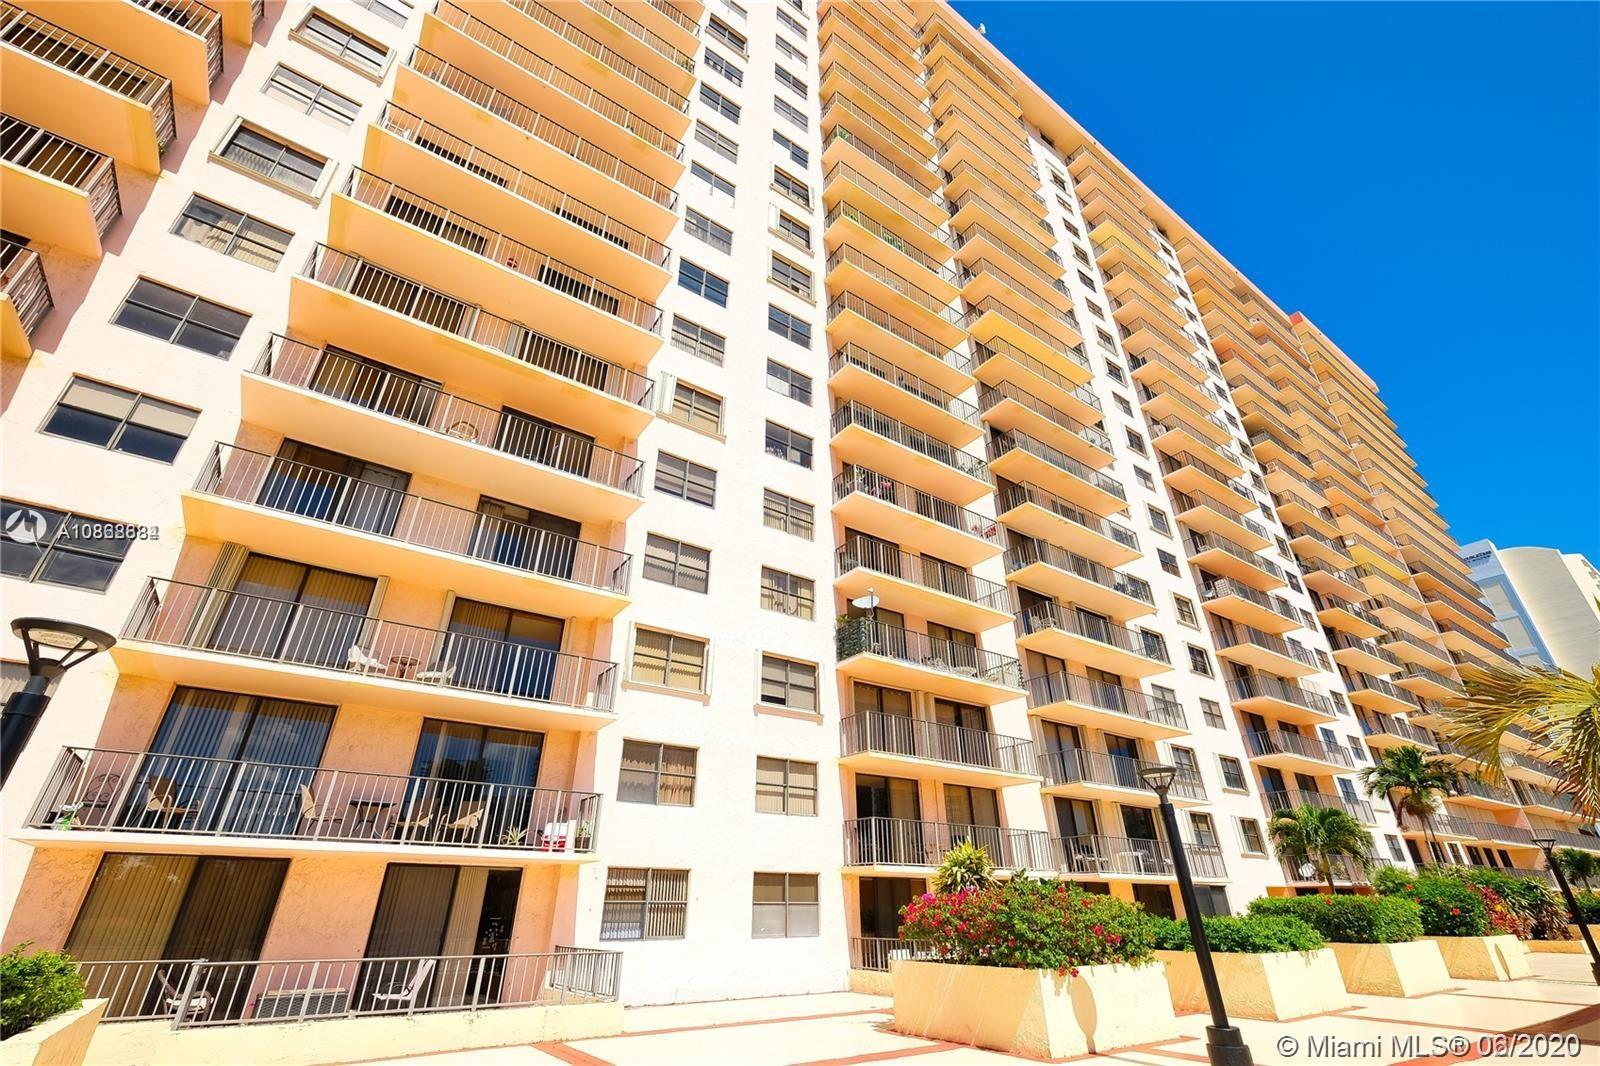 Winston Tower 600 #1106 - 210 174th St #1106, Sunny Isles Beach, FL 33160